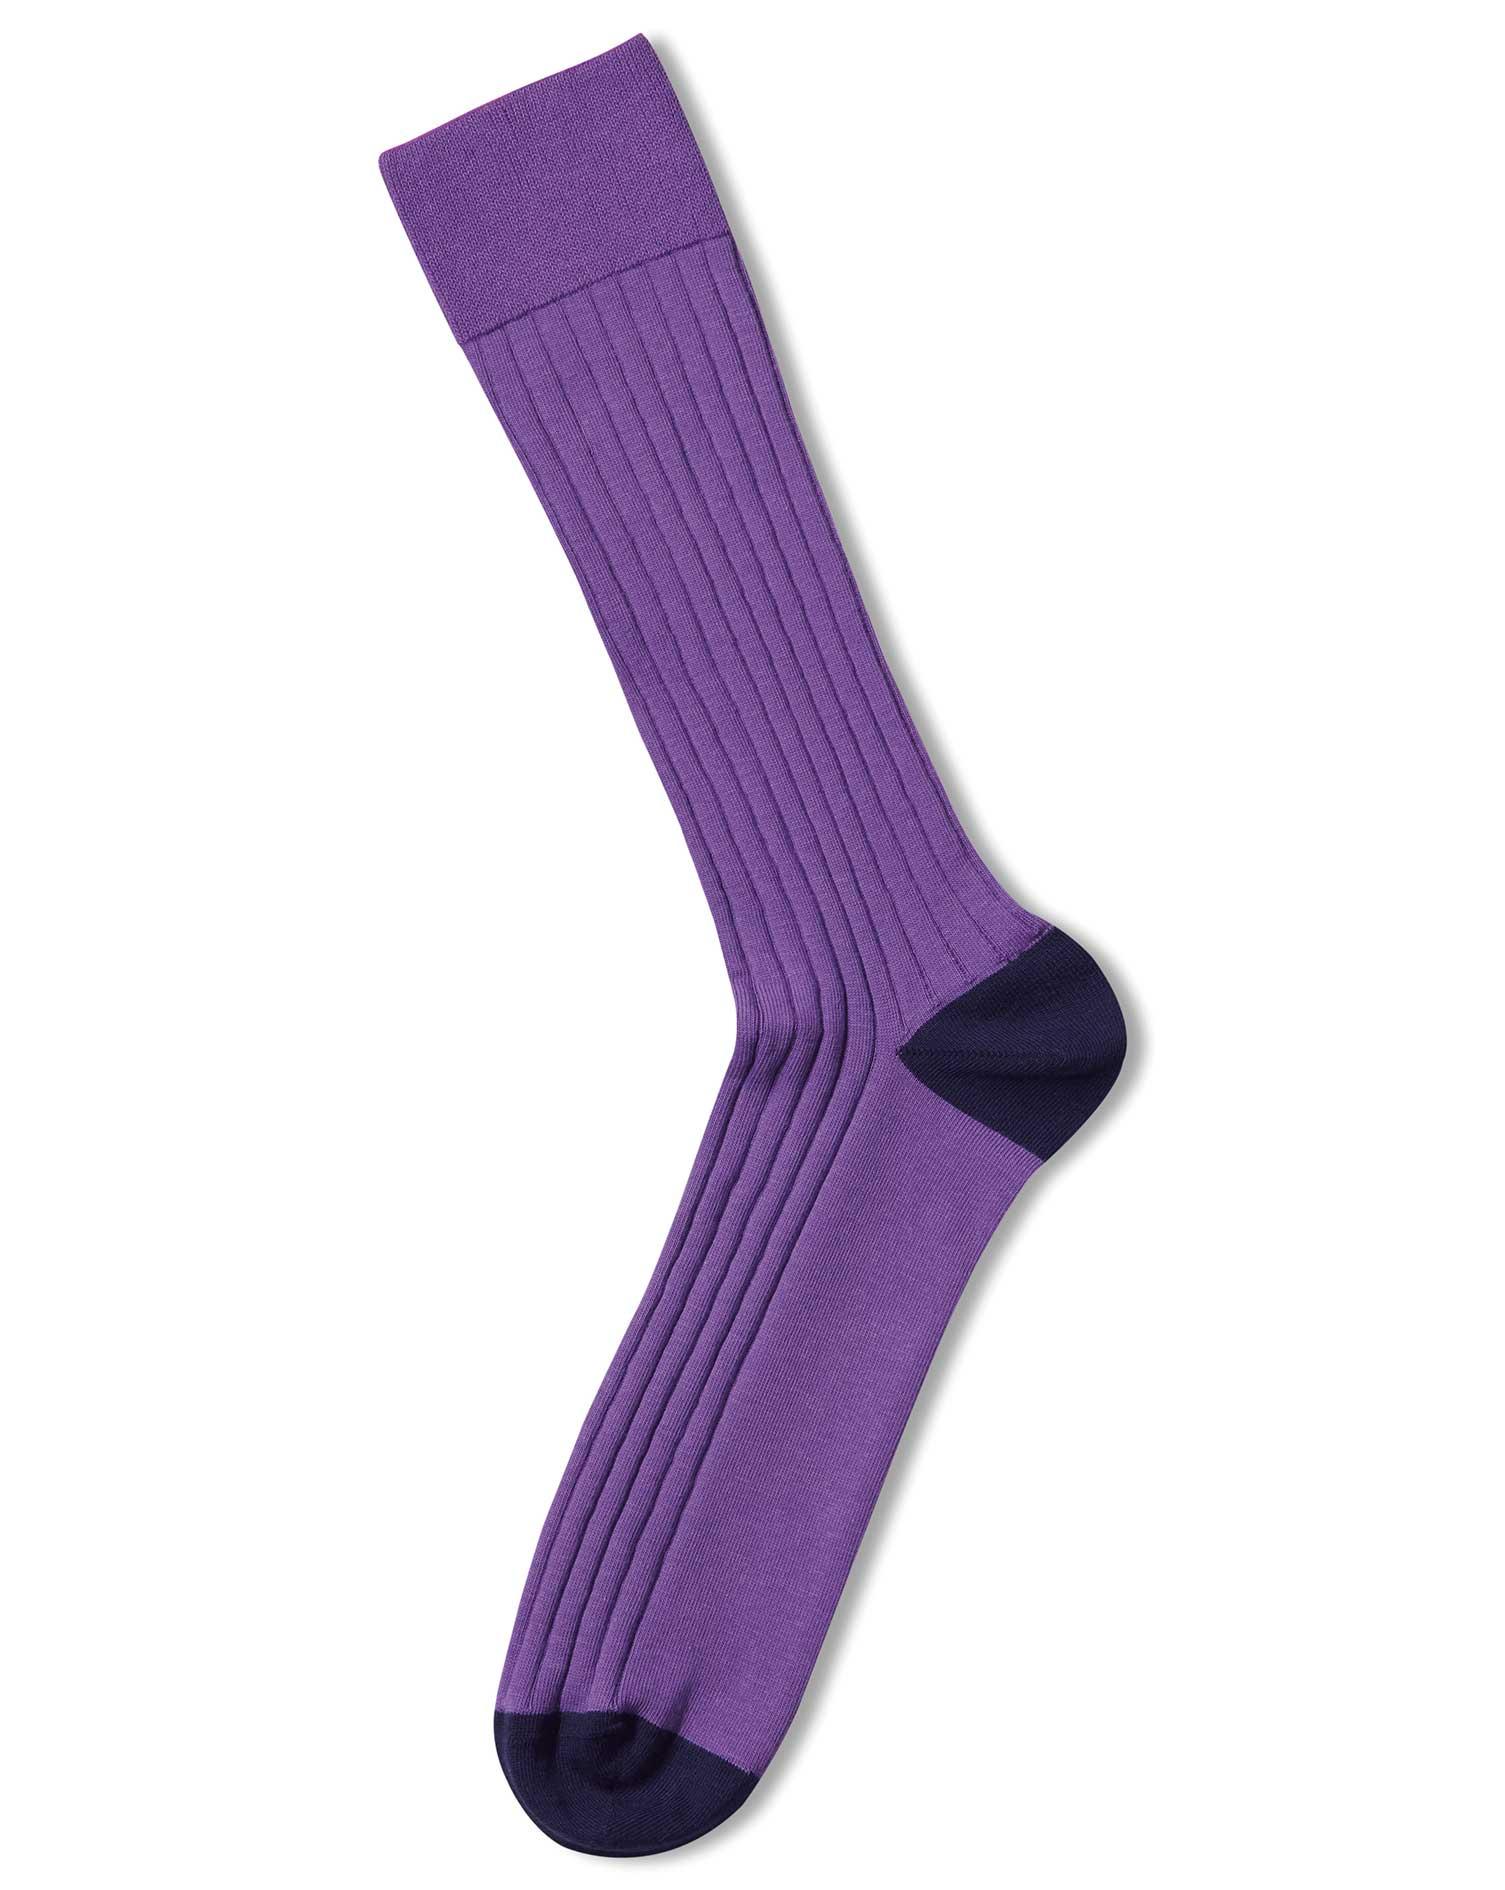 Purple Cotton Rib Socks Size Large by Charles Tyrwhitt